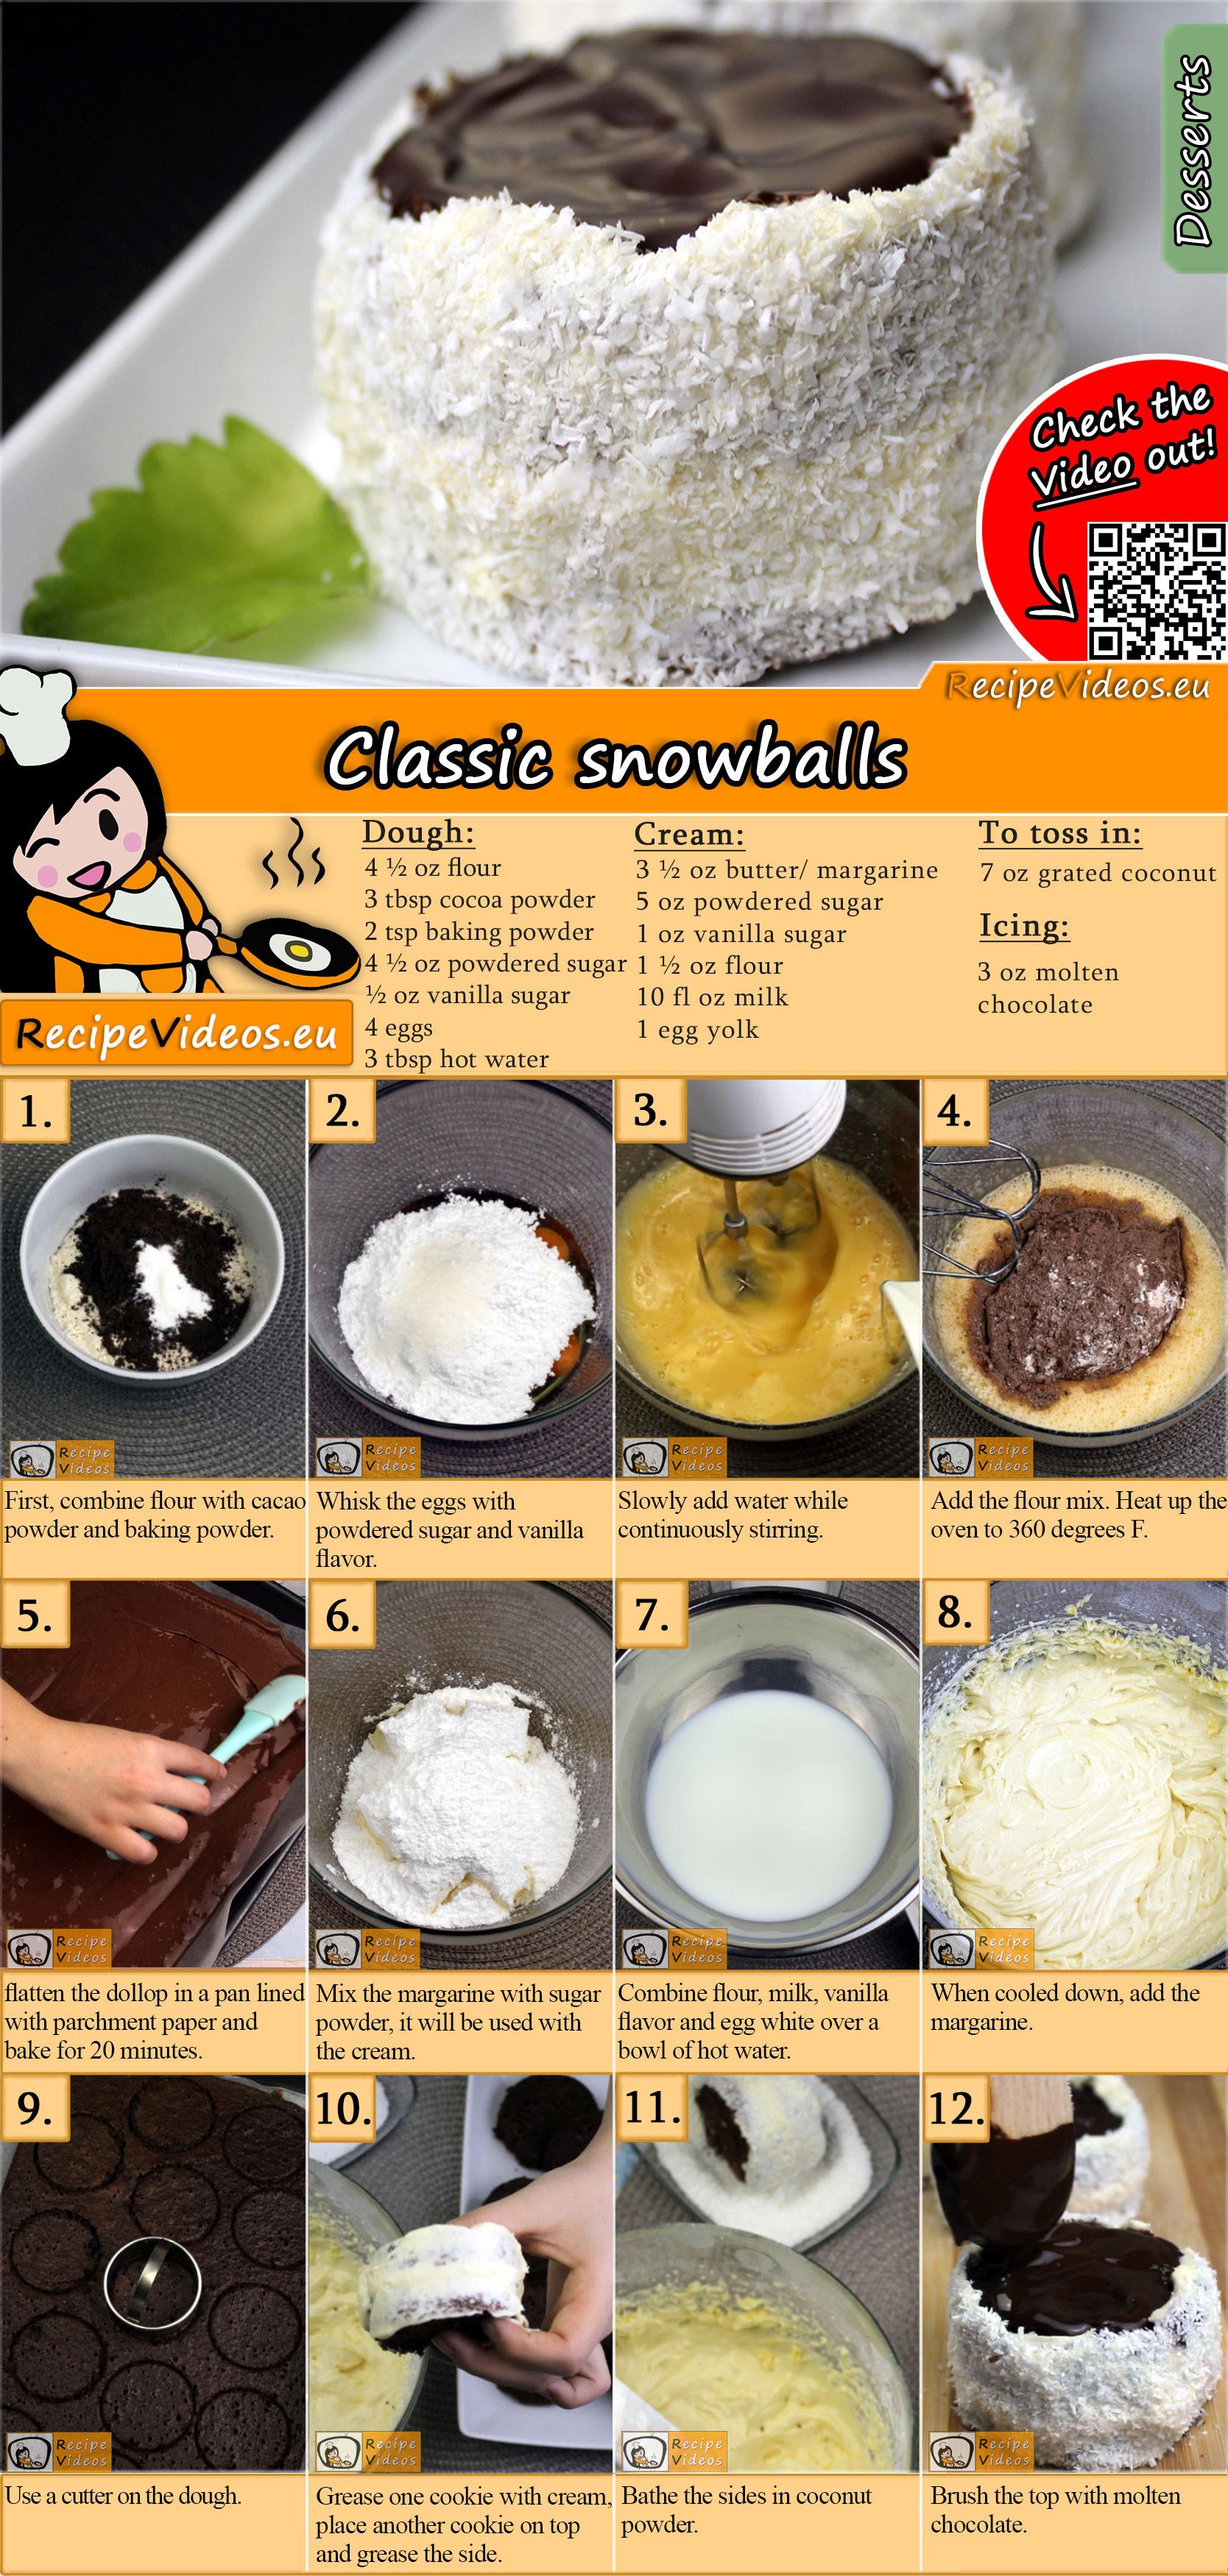 Classic snowballs recipe with video